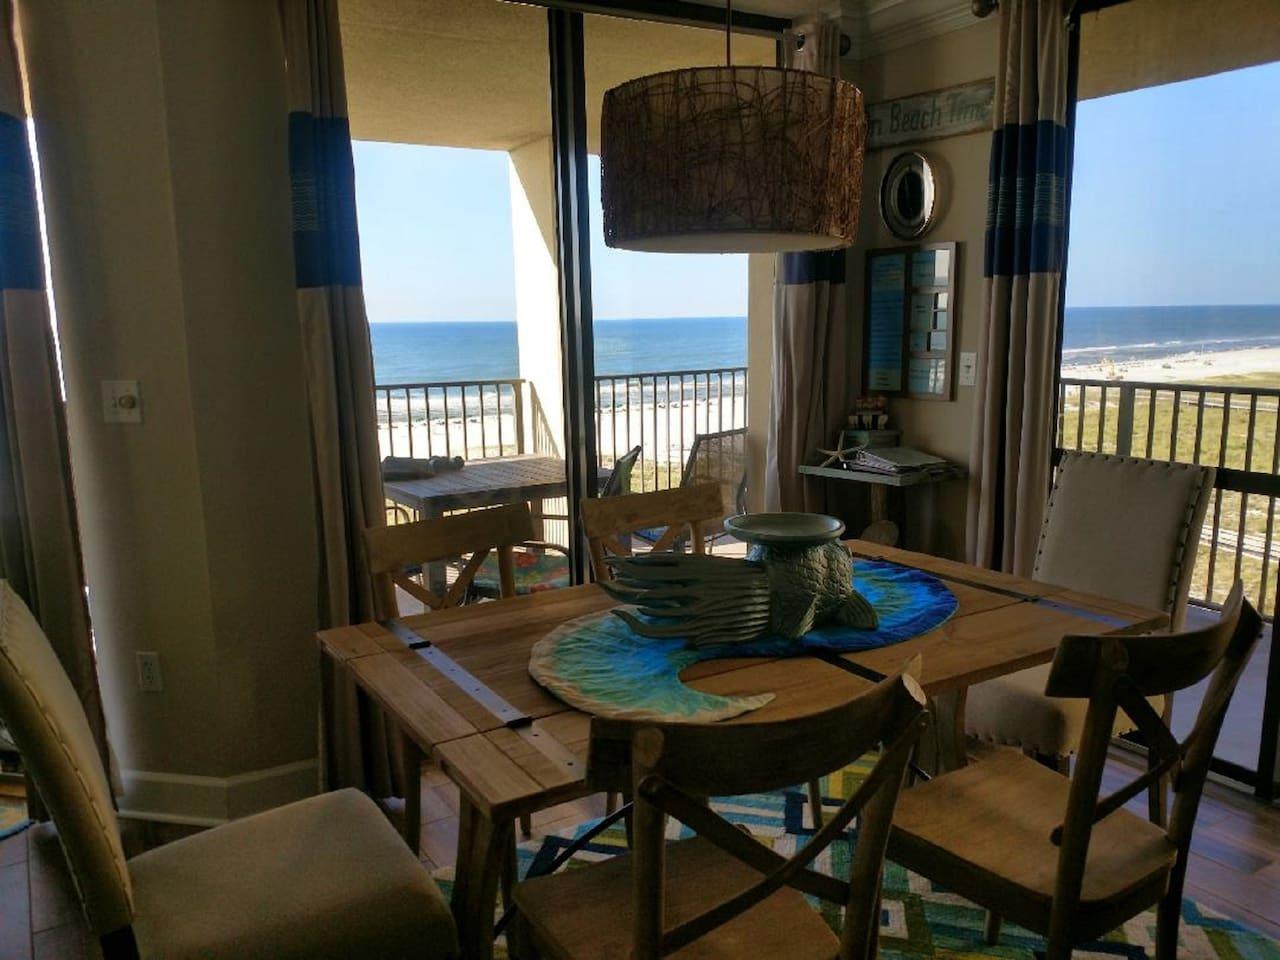 Beachfront Airbnb in Orange Beach Alabama